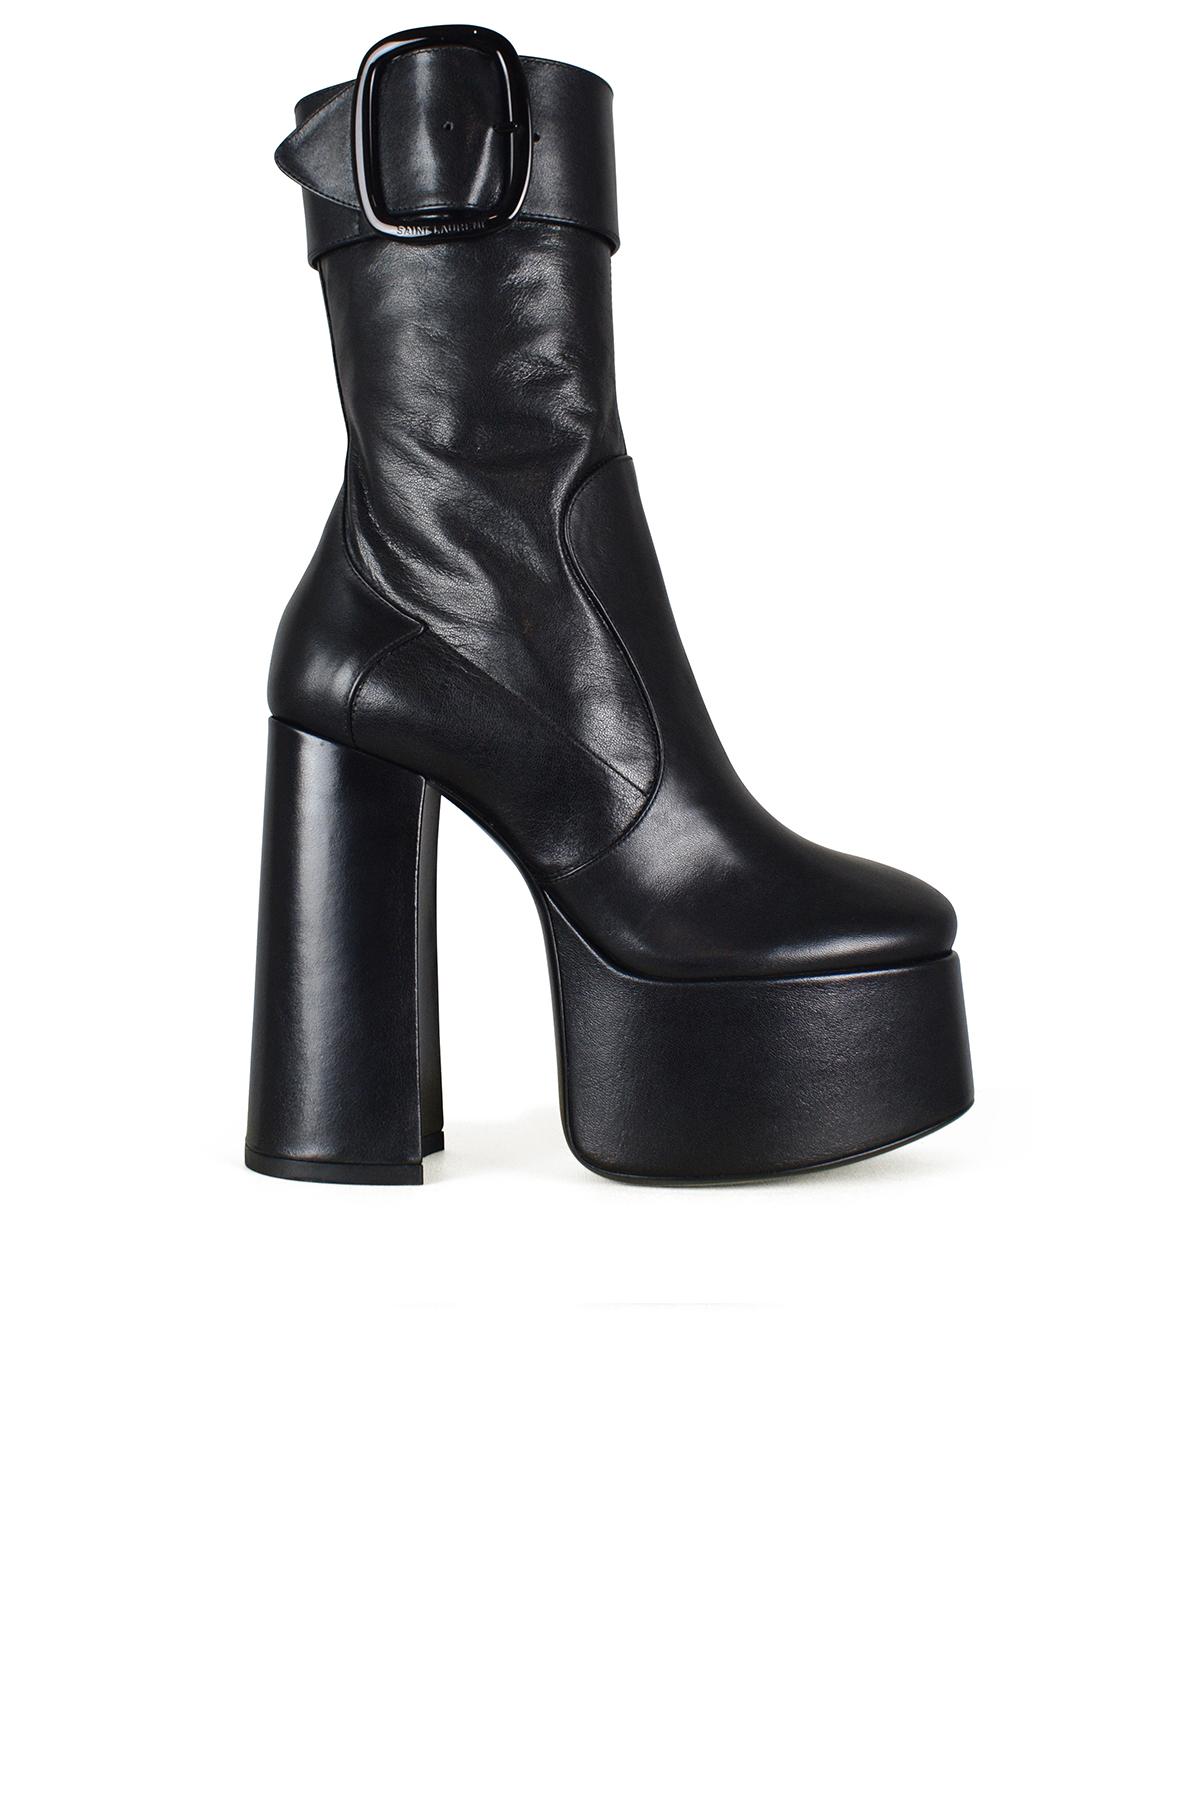 Billy Saint Laurent platform boots in black leather.